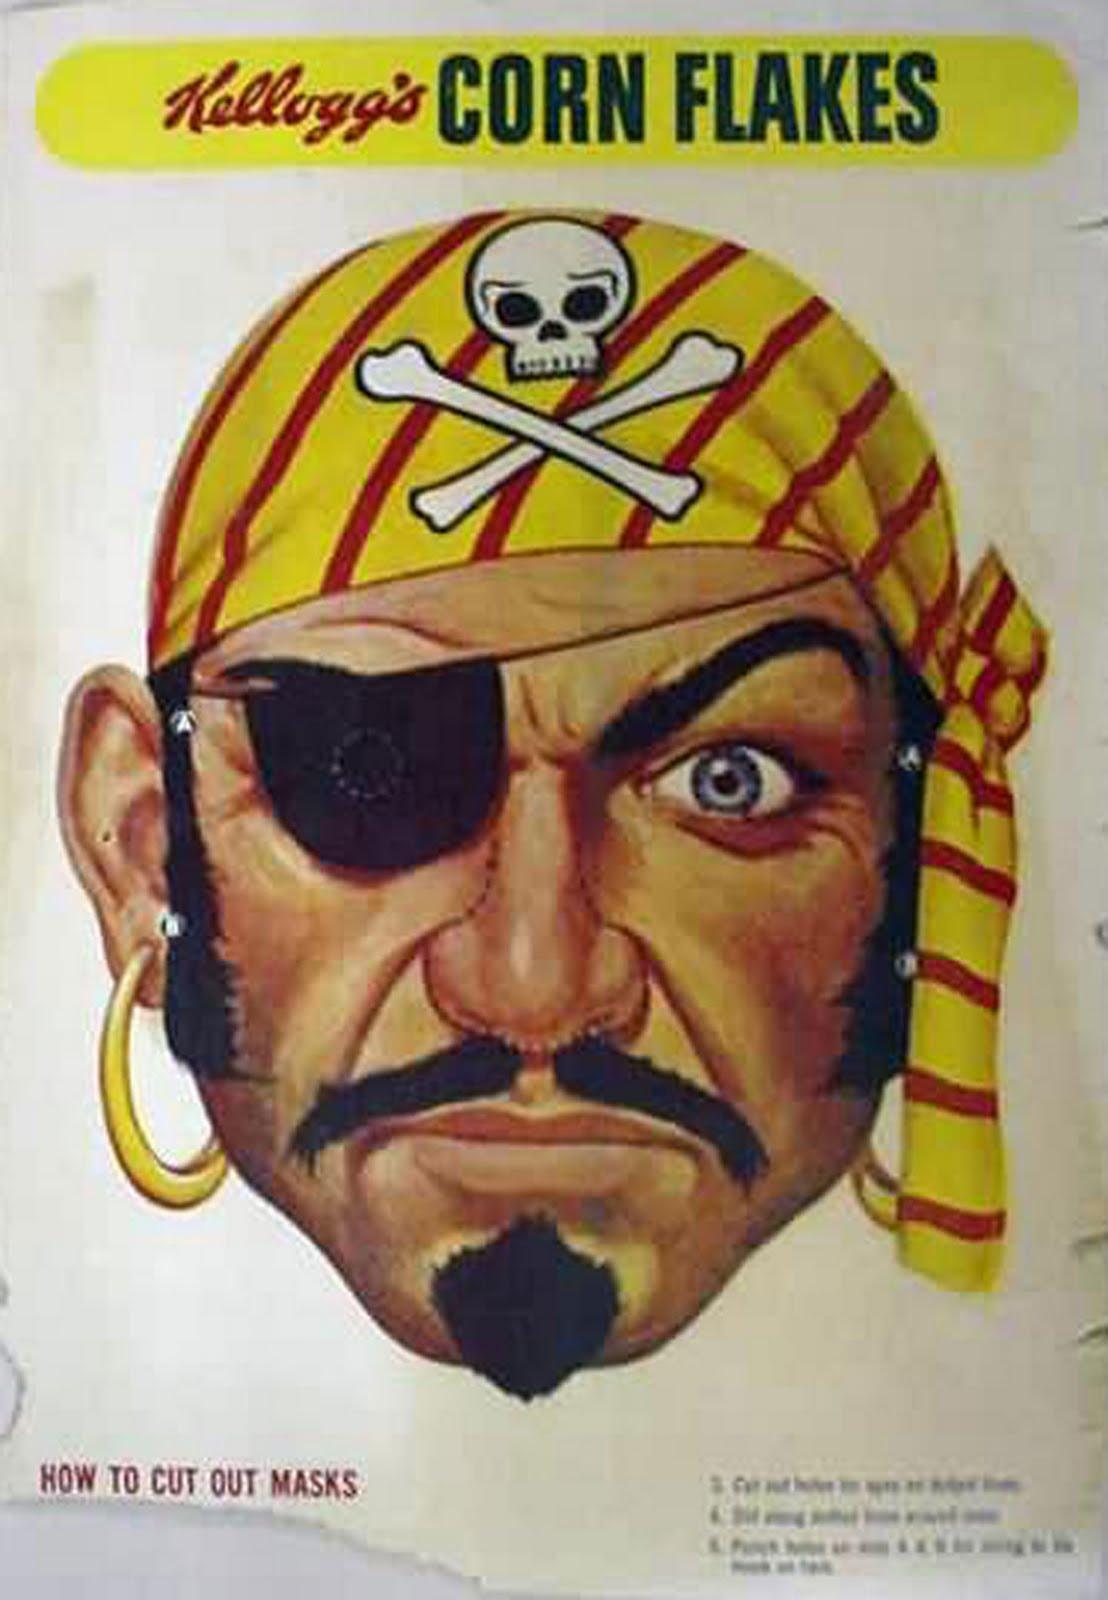 John Rozum.com: 31 Days of Halloween - Day 23 - Mask of the Day